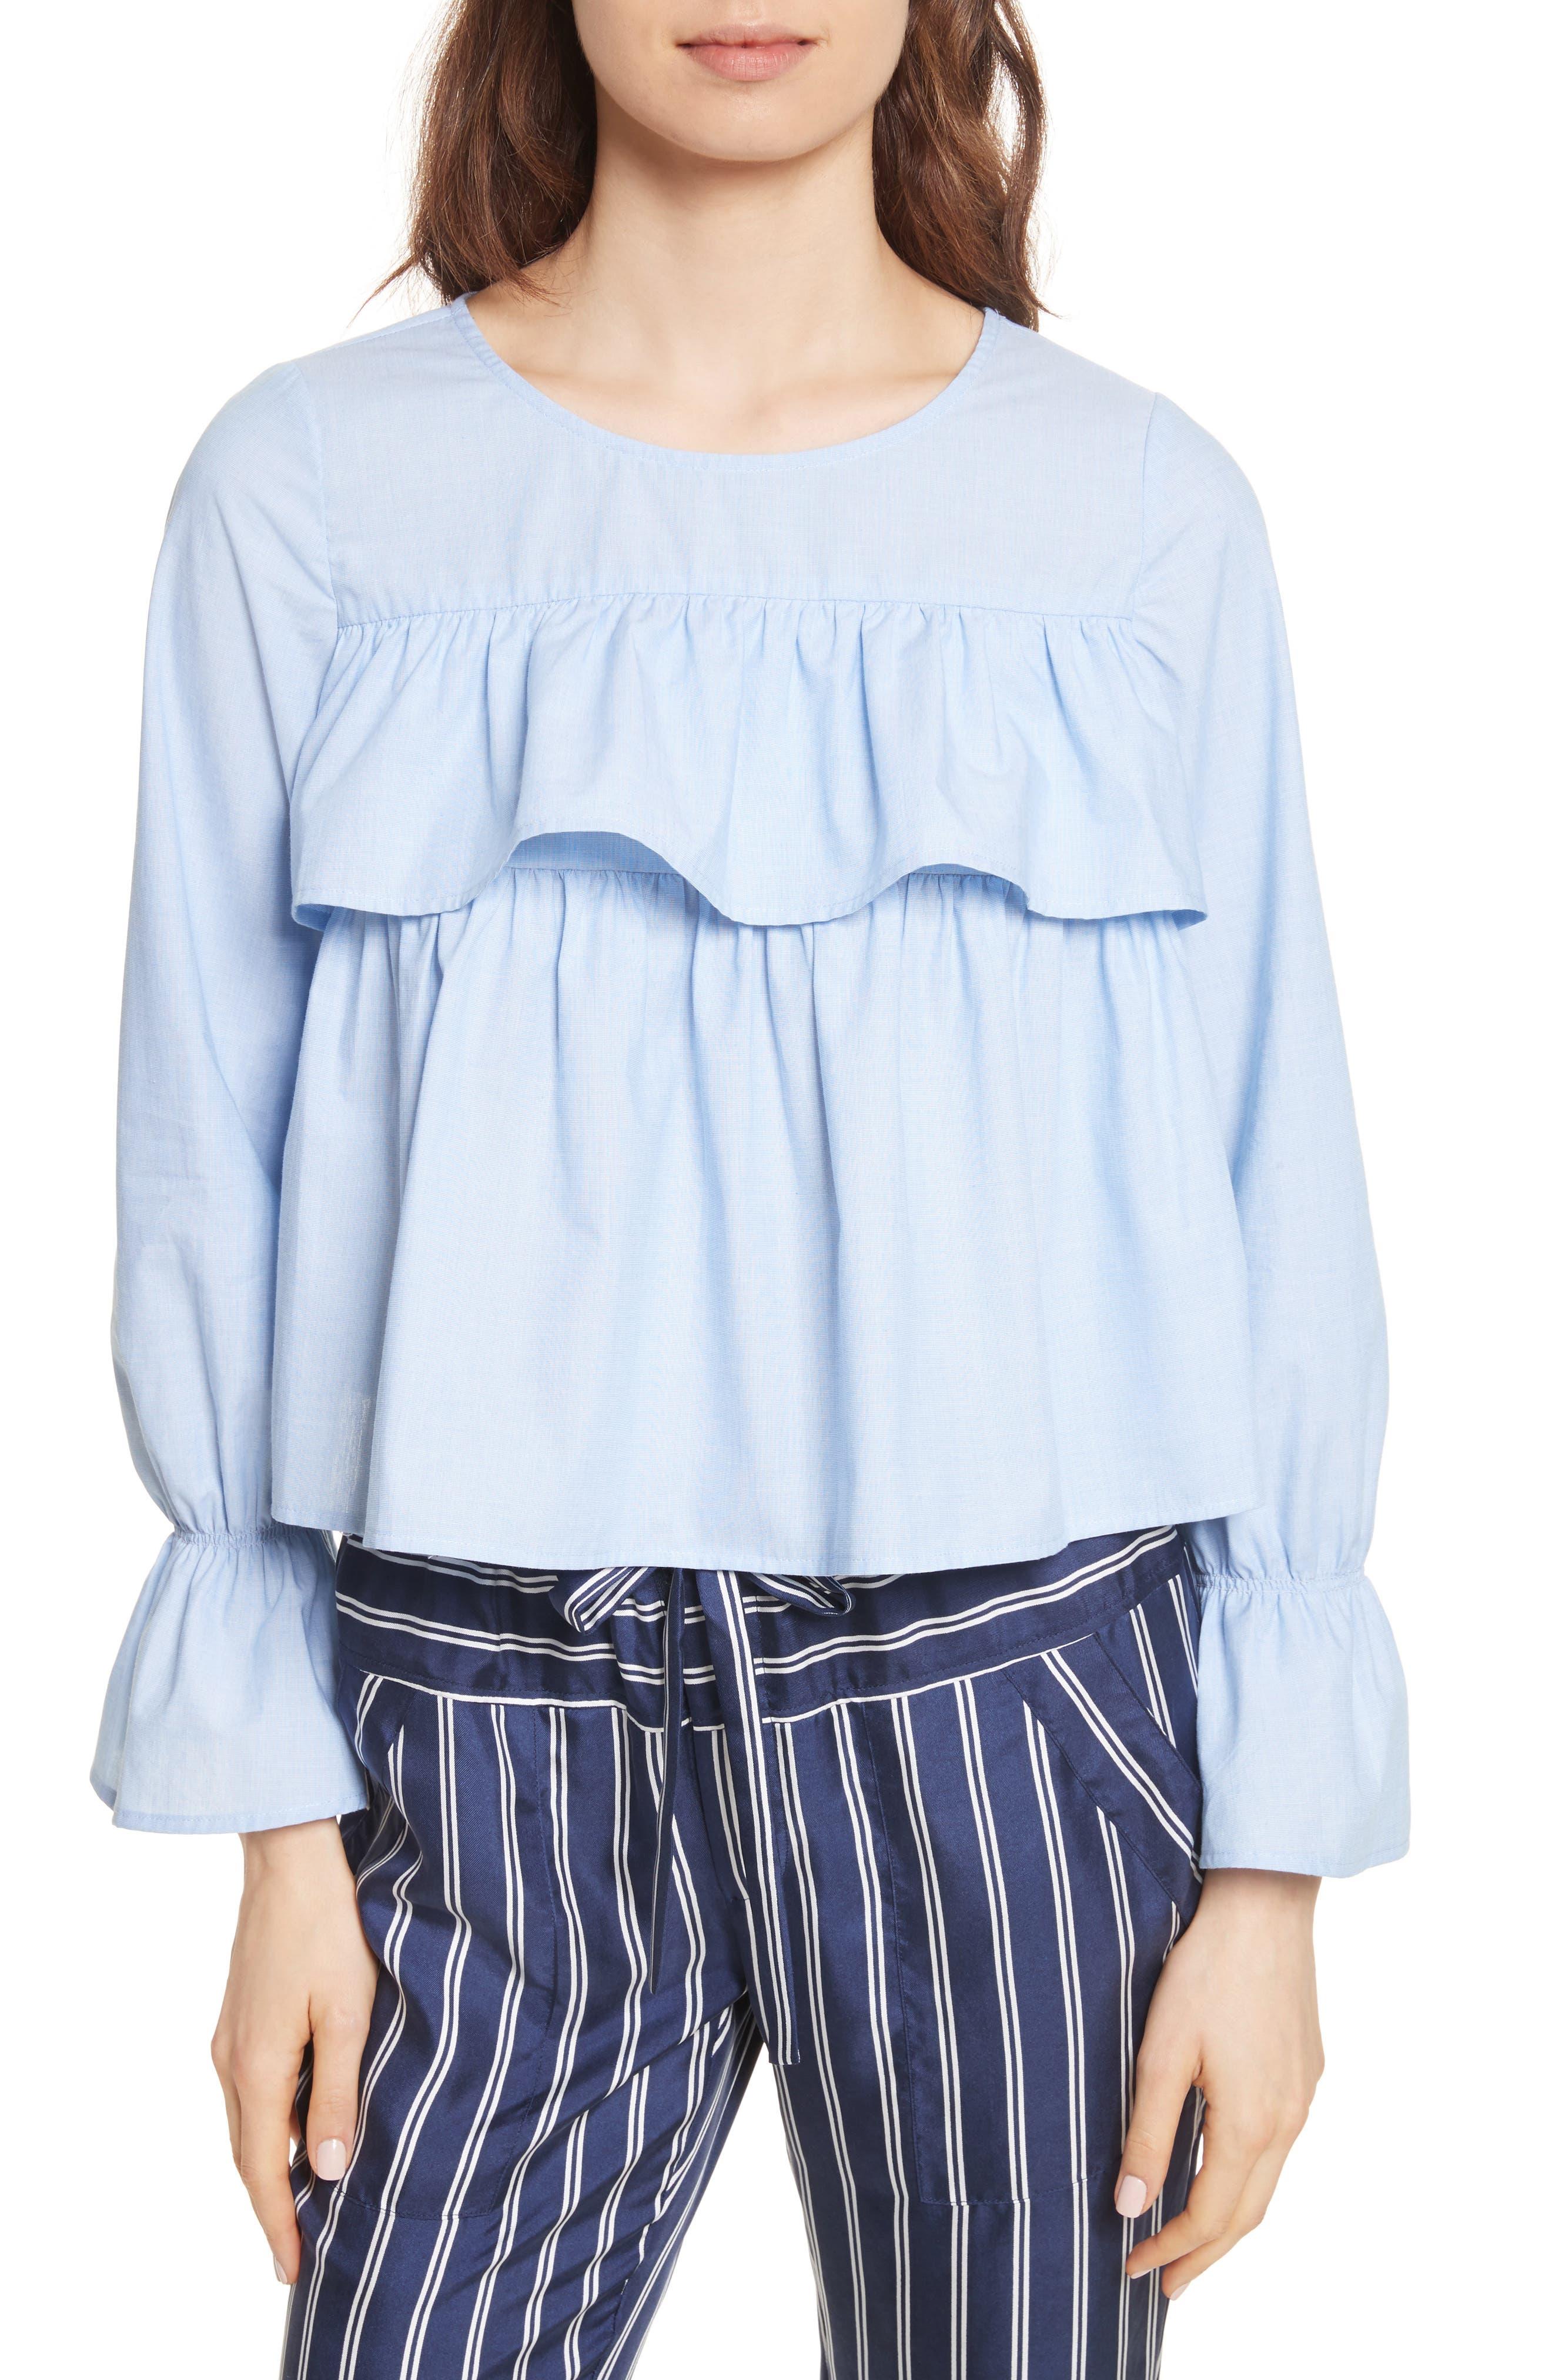 Adotte Cotton Top,                         Main,                         color, Maritime Chambray